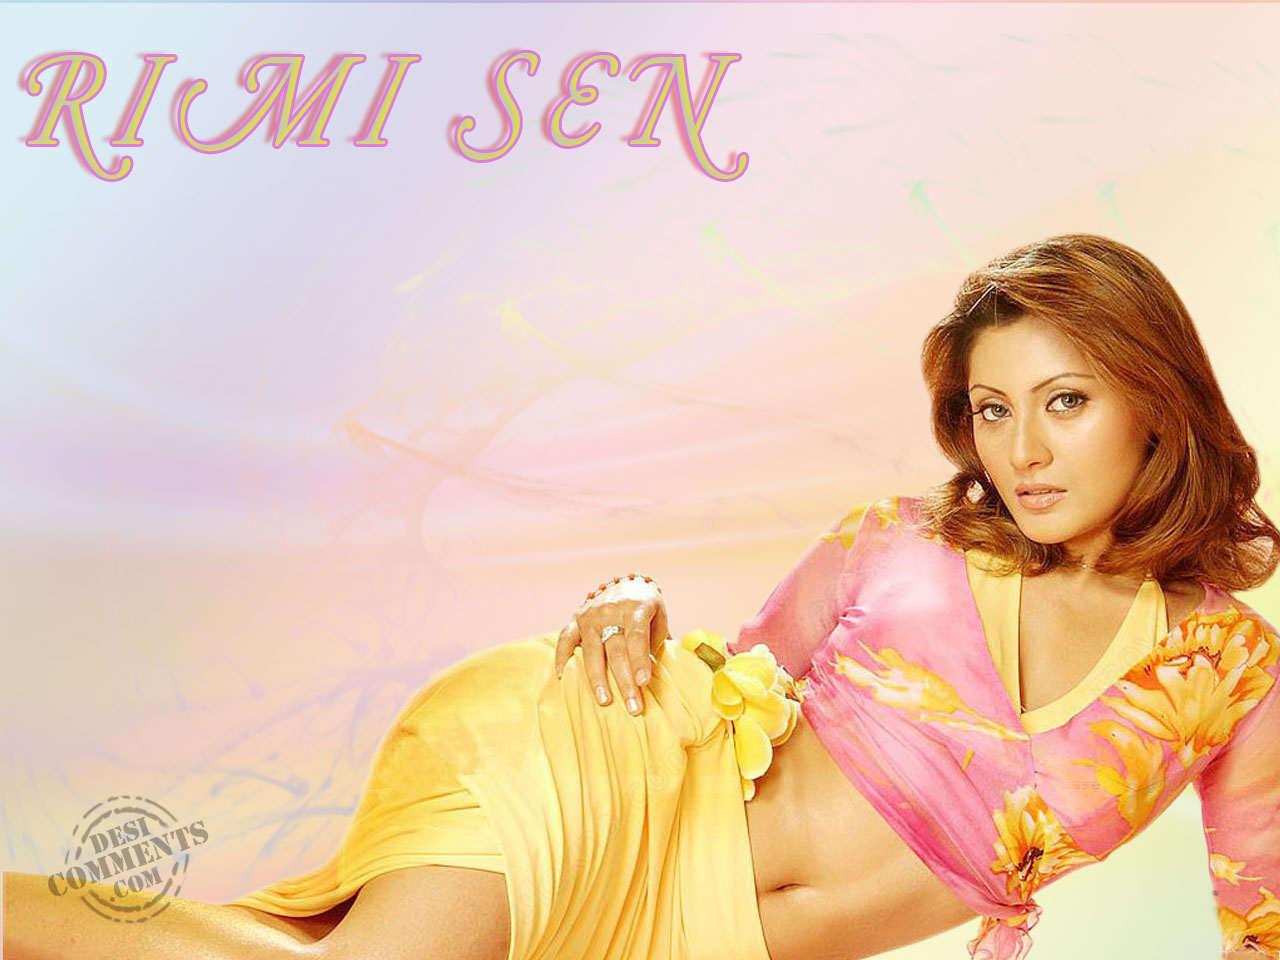 http://2.bp.blogspot.com/-Xcux73ok83U/TgqJzEXNaSI/AAAAAAAABBY/aj2AZEZ2C_c/s1600/Rimi-Sen-Wallpapers-05.jpg